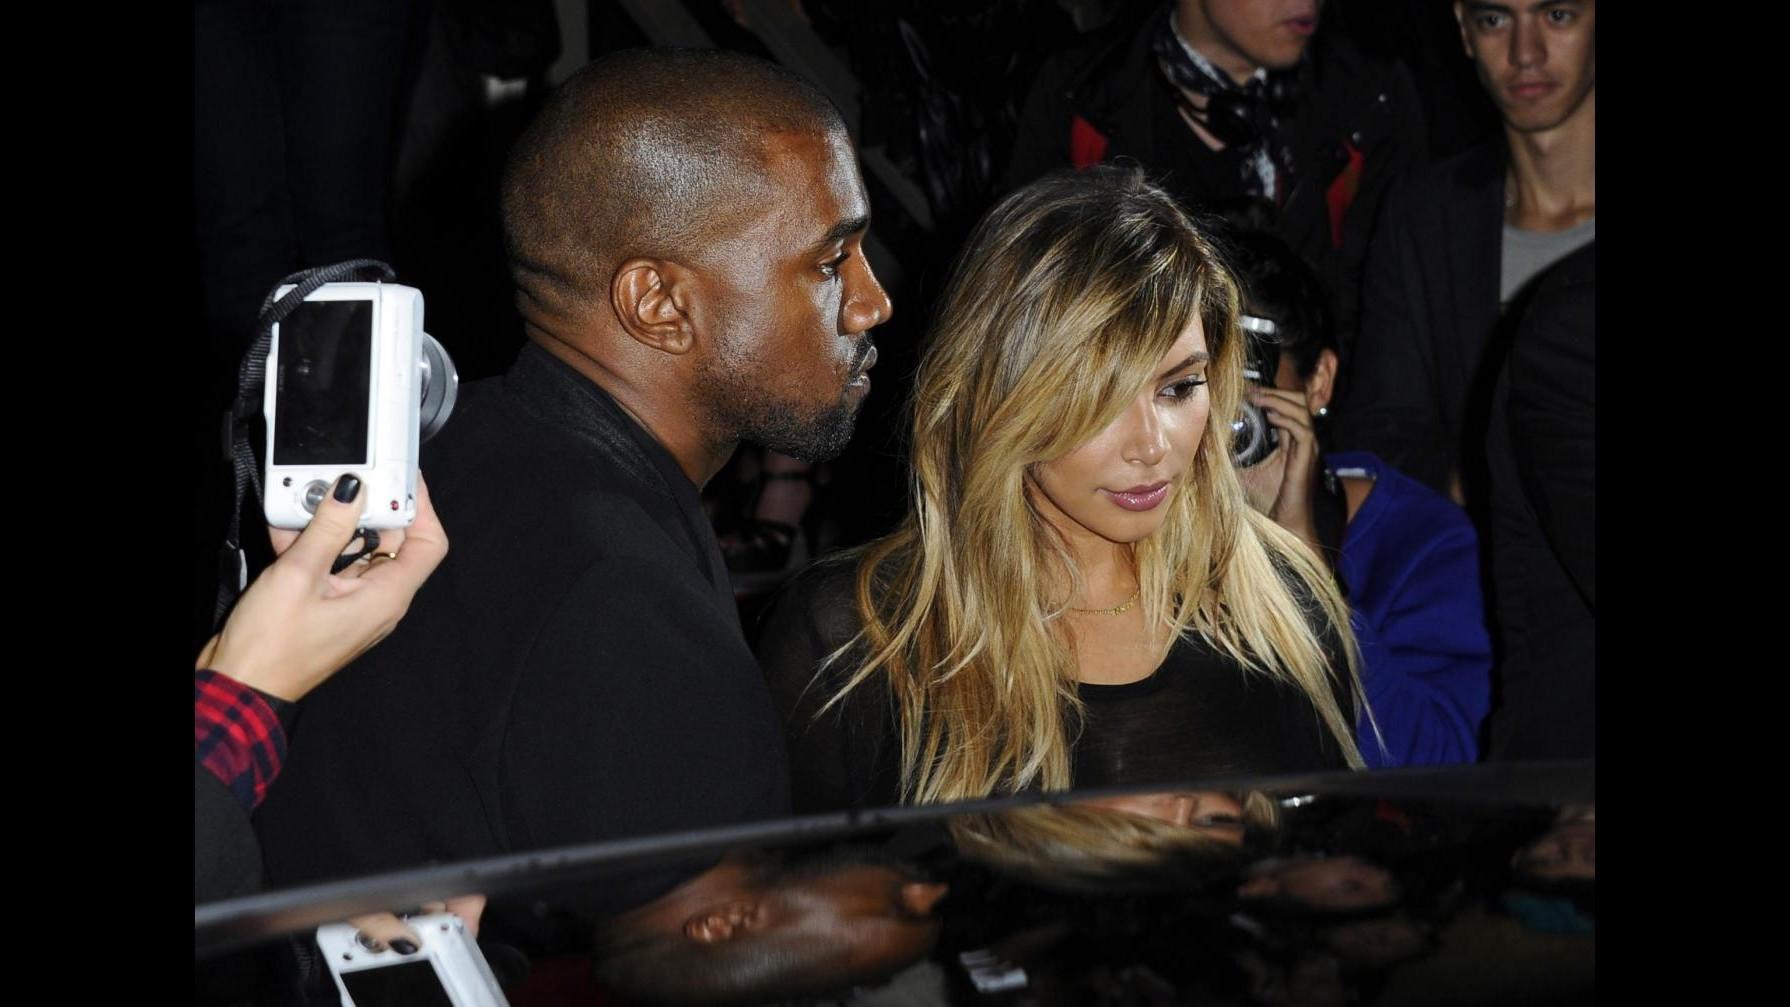 Comune Firenze conferma: Qui le nozze tra Kim Kardashian e Kanye West